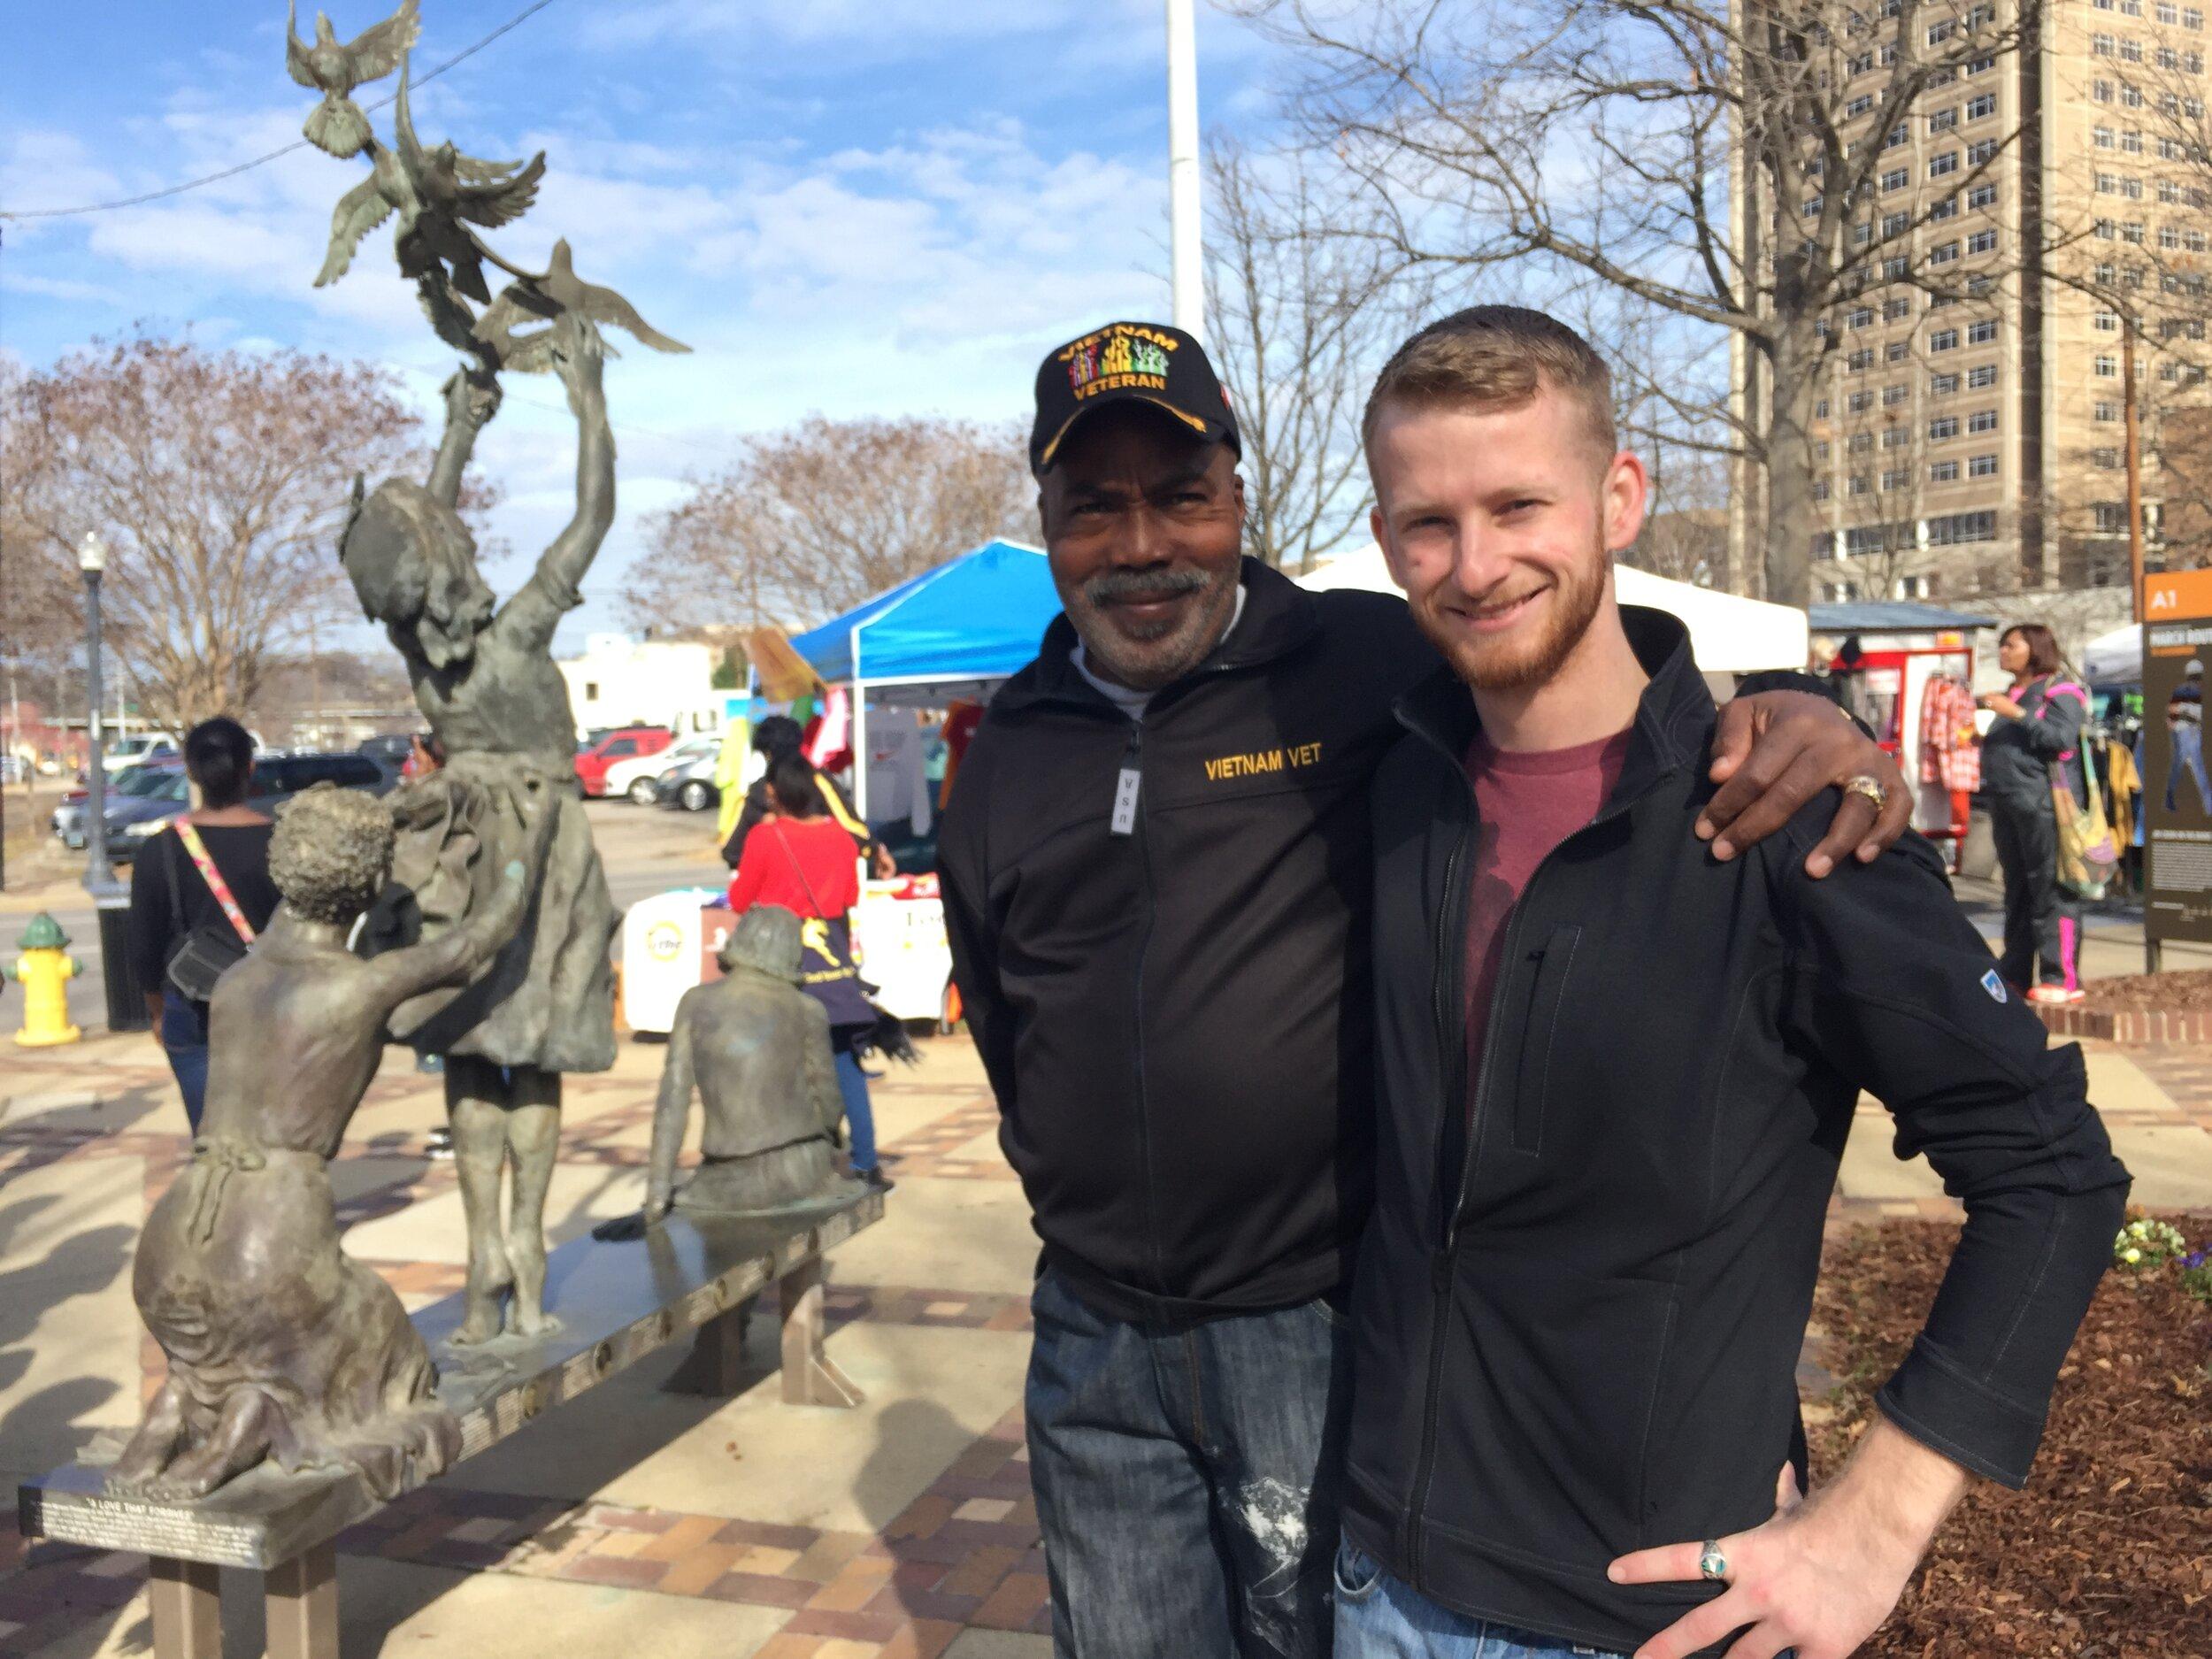 My son, Will, with George in Birmingham, AL.